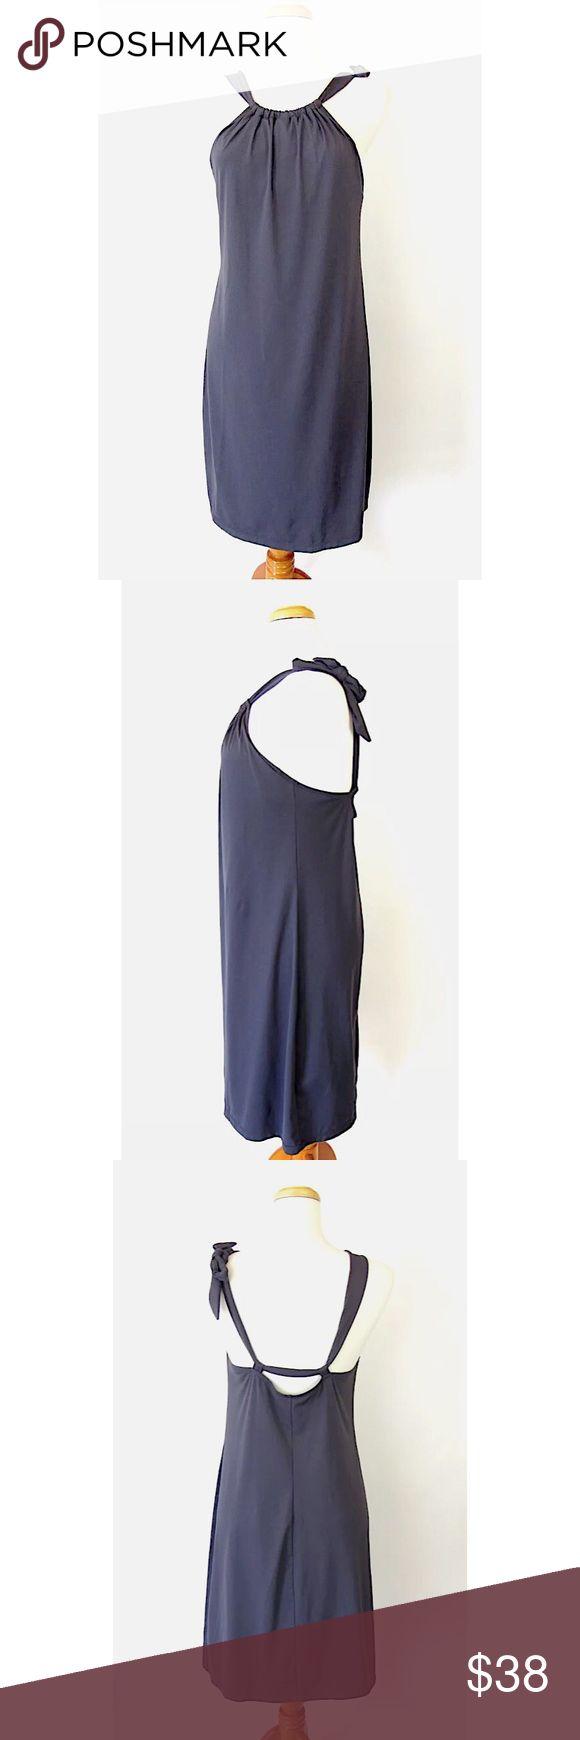 "Athleta Kokomo Dress Charcoal Gray Swim Sz L Brand: Athleta Style:  Kokomo: Adjustable Strap Beach/Swim Dress, Built in Shelf Bra Size:  Large Color/Pattern: Charcoal Gray Material:  75% Nylon, 25% Spandex Measurements taken flat:   -Across under arm: 17"" -Shoulder to hem: 42"" Care Instructions: Machine wash, line dry  Condition: No flaws. See pictures for details. Athleta Dresses Midi"